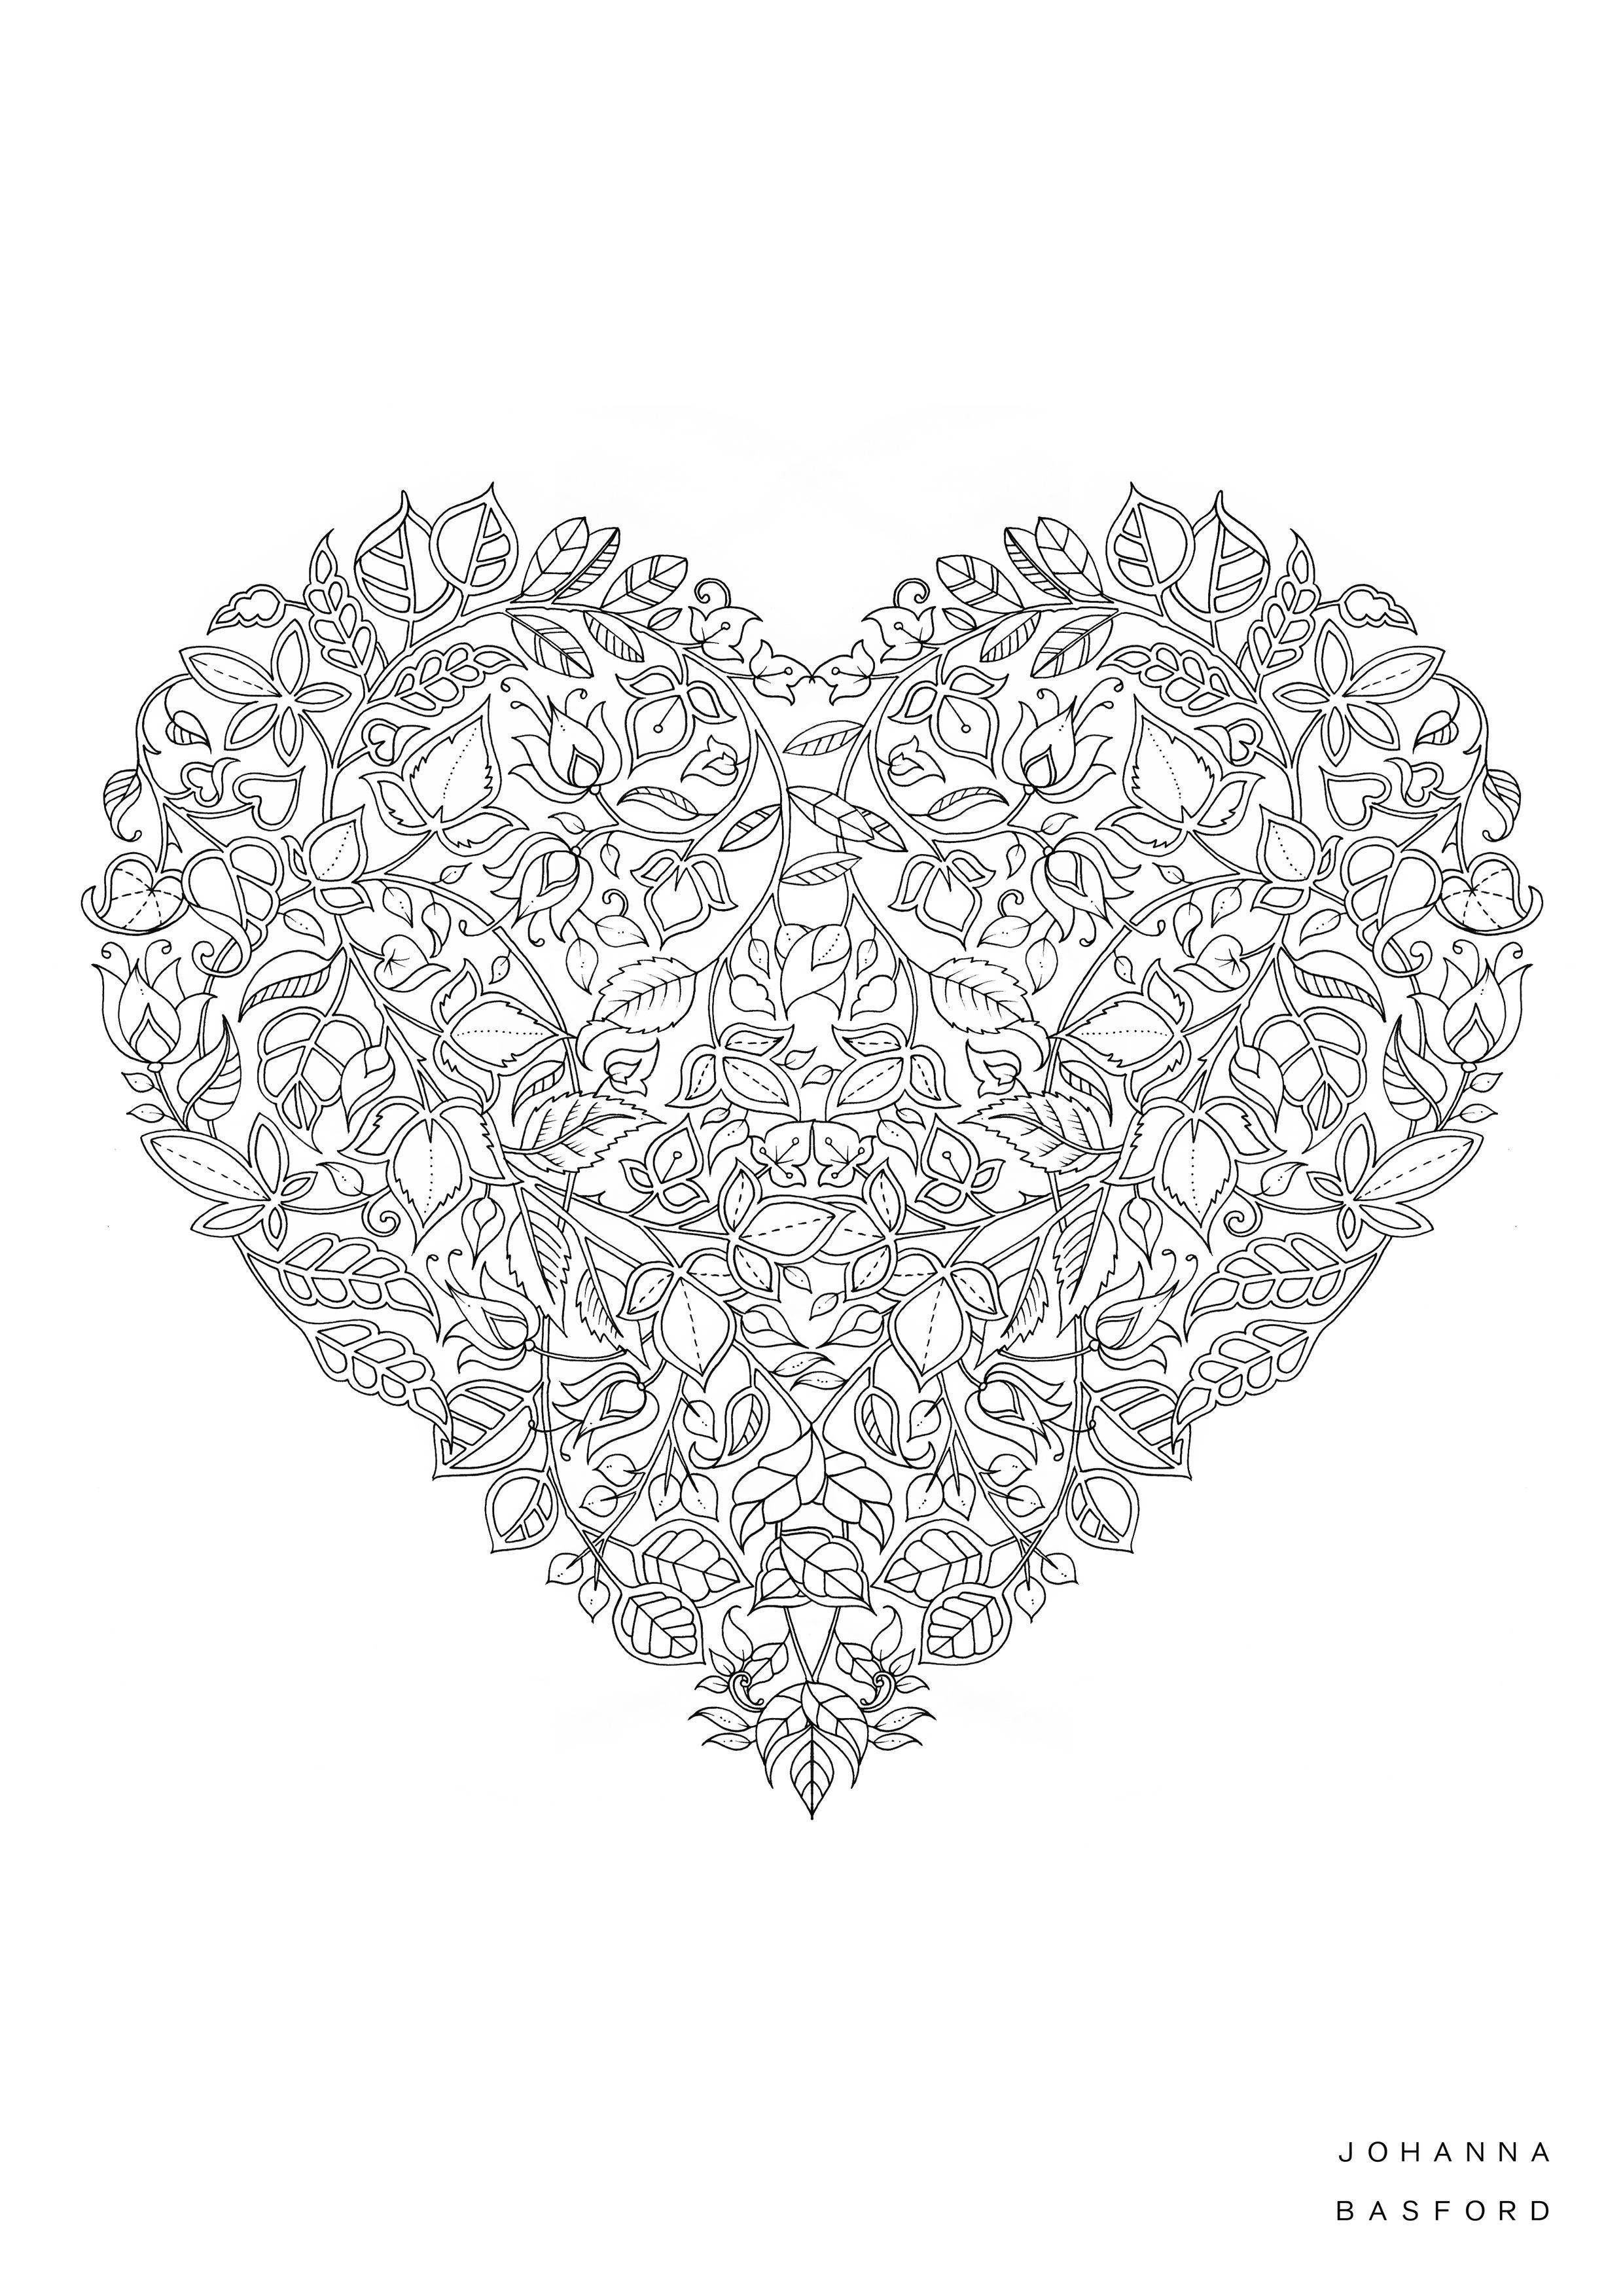 Pin de passarini antonio julio en corazones | Pinterest | Mandalas ...